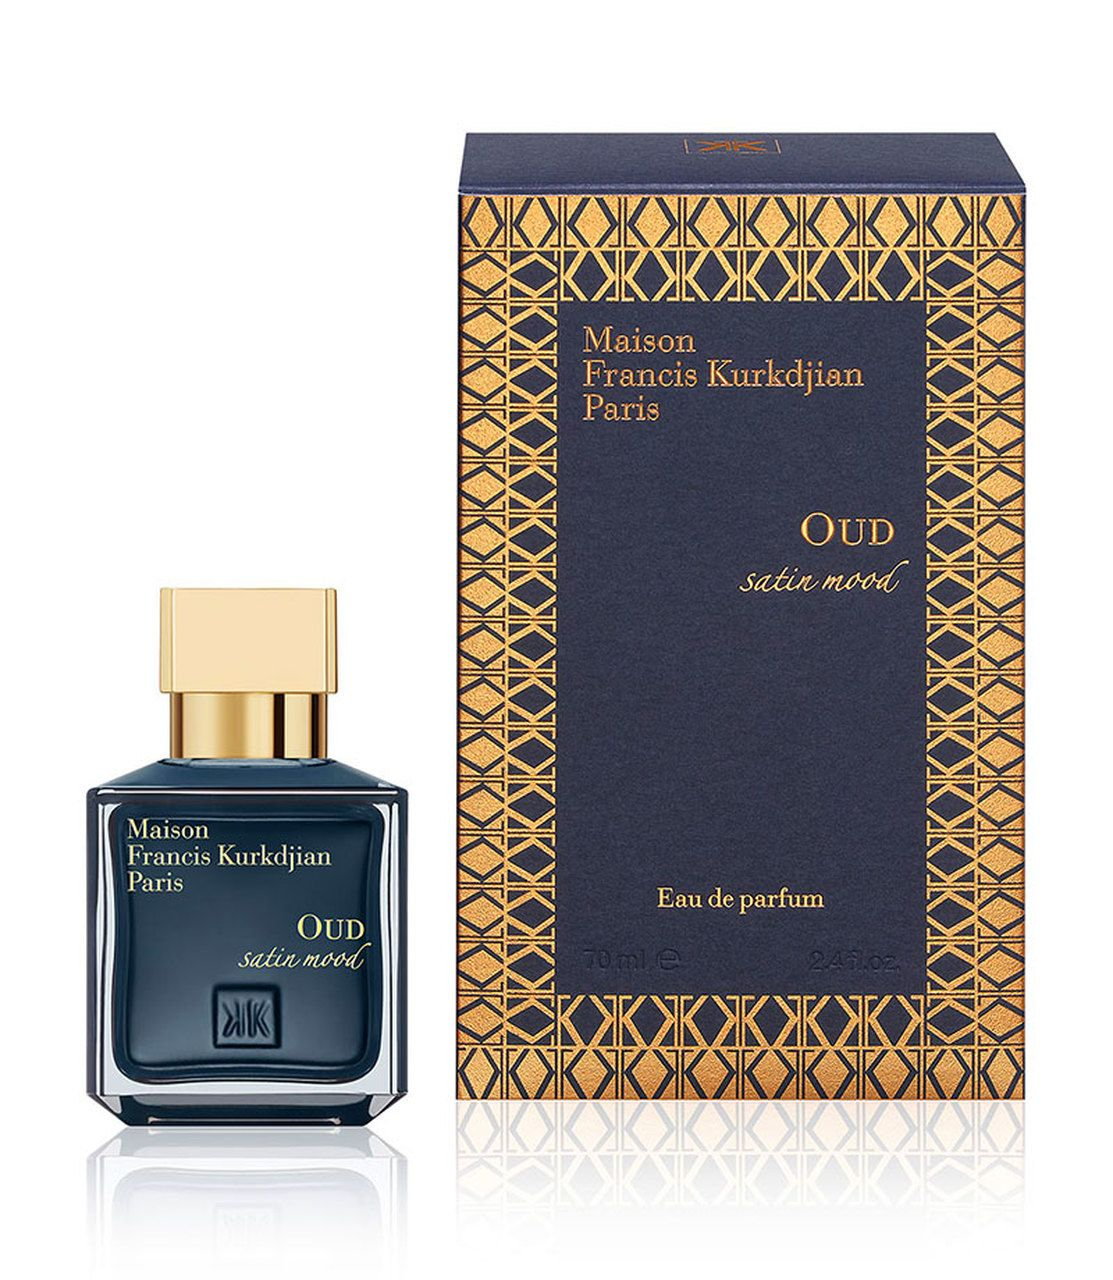 Maison Francis Kurkdjian Oud Satin Mood Eau De Parfum Spray 2 4 Oz Unisex Eau De Parfum Maison Francis Kurkdjian Perfume